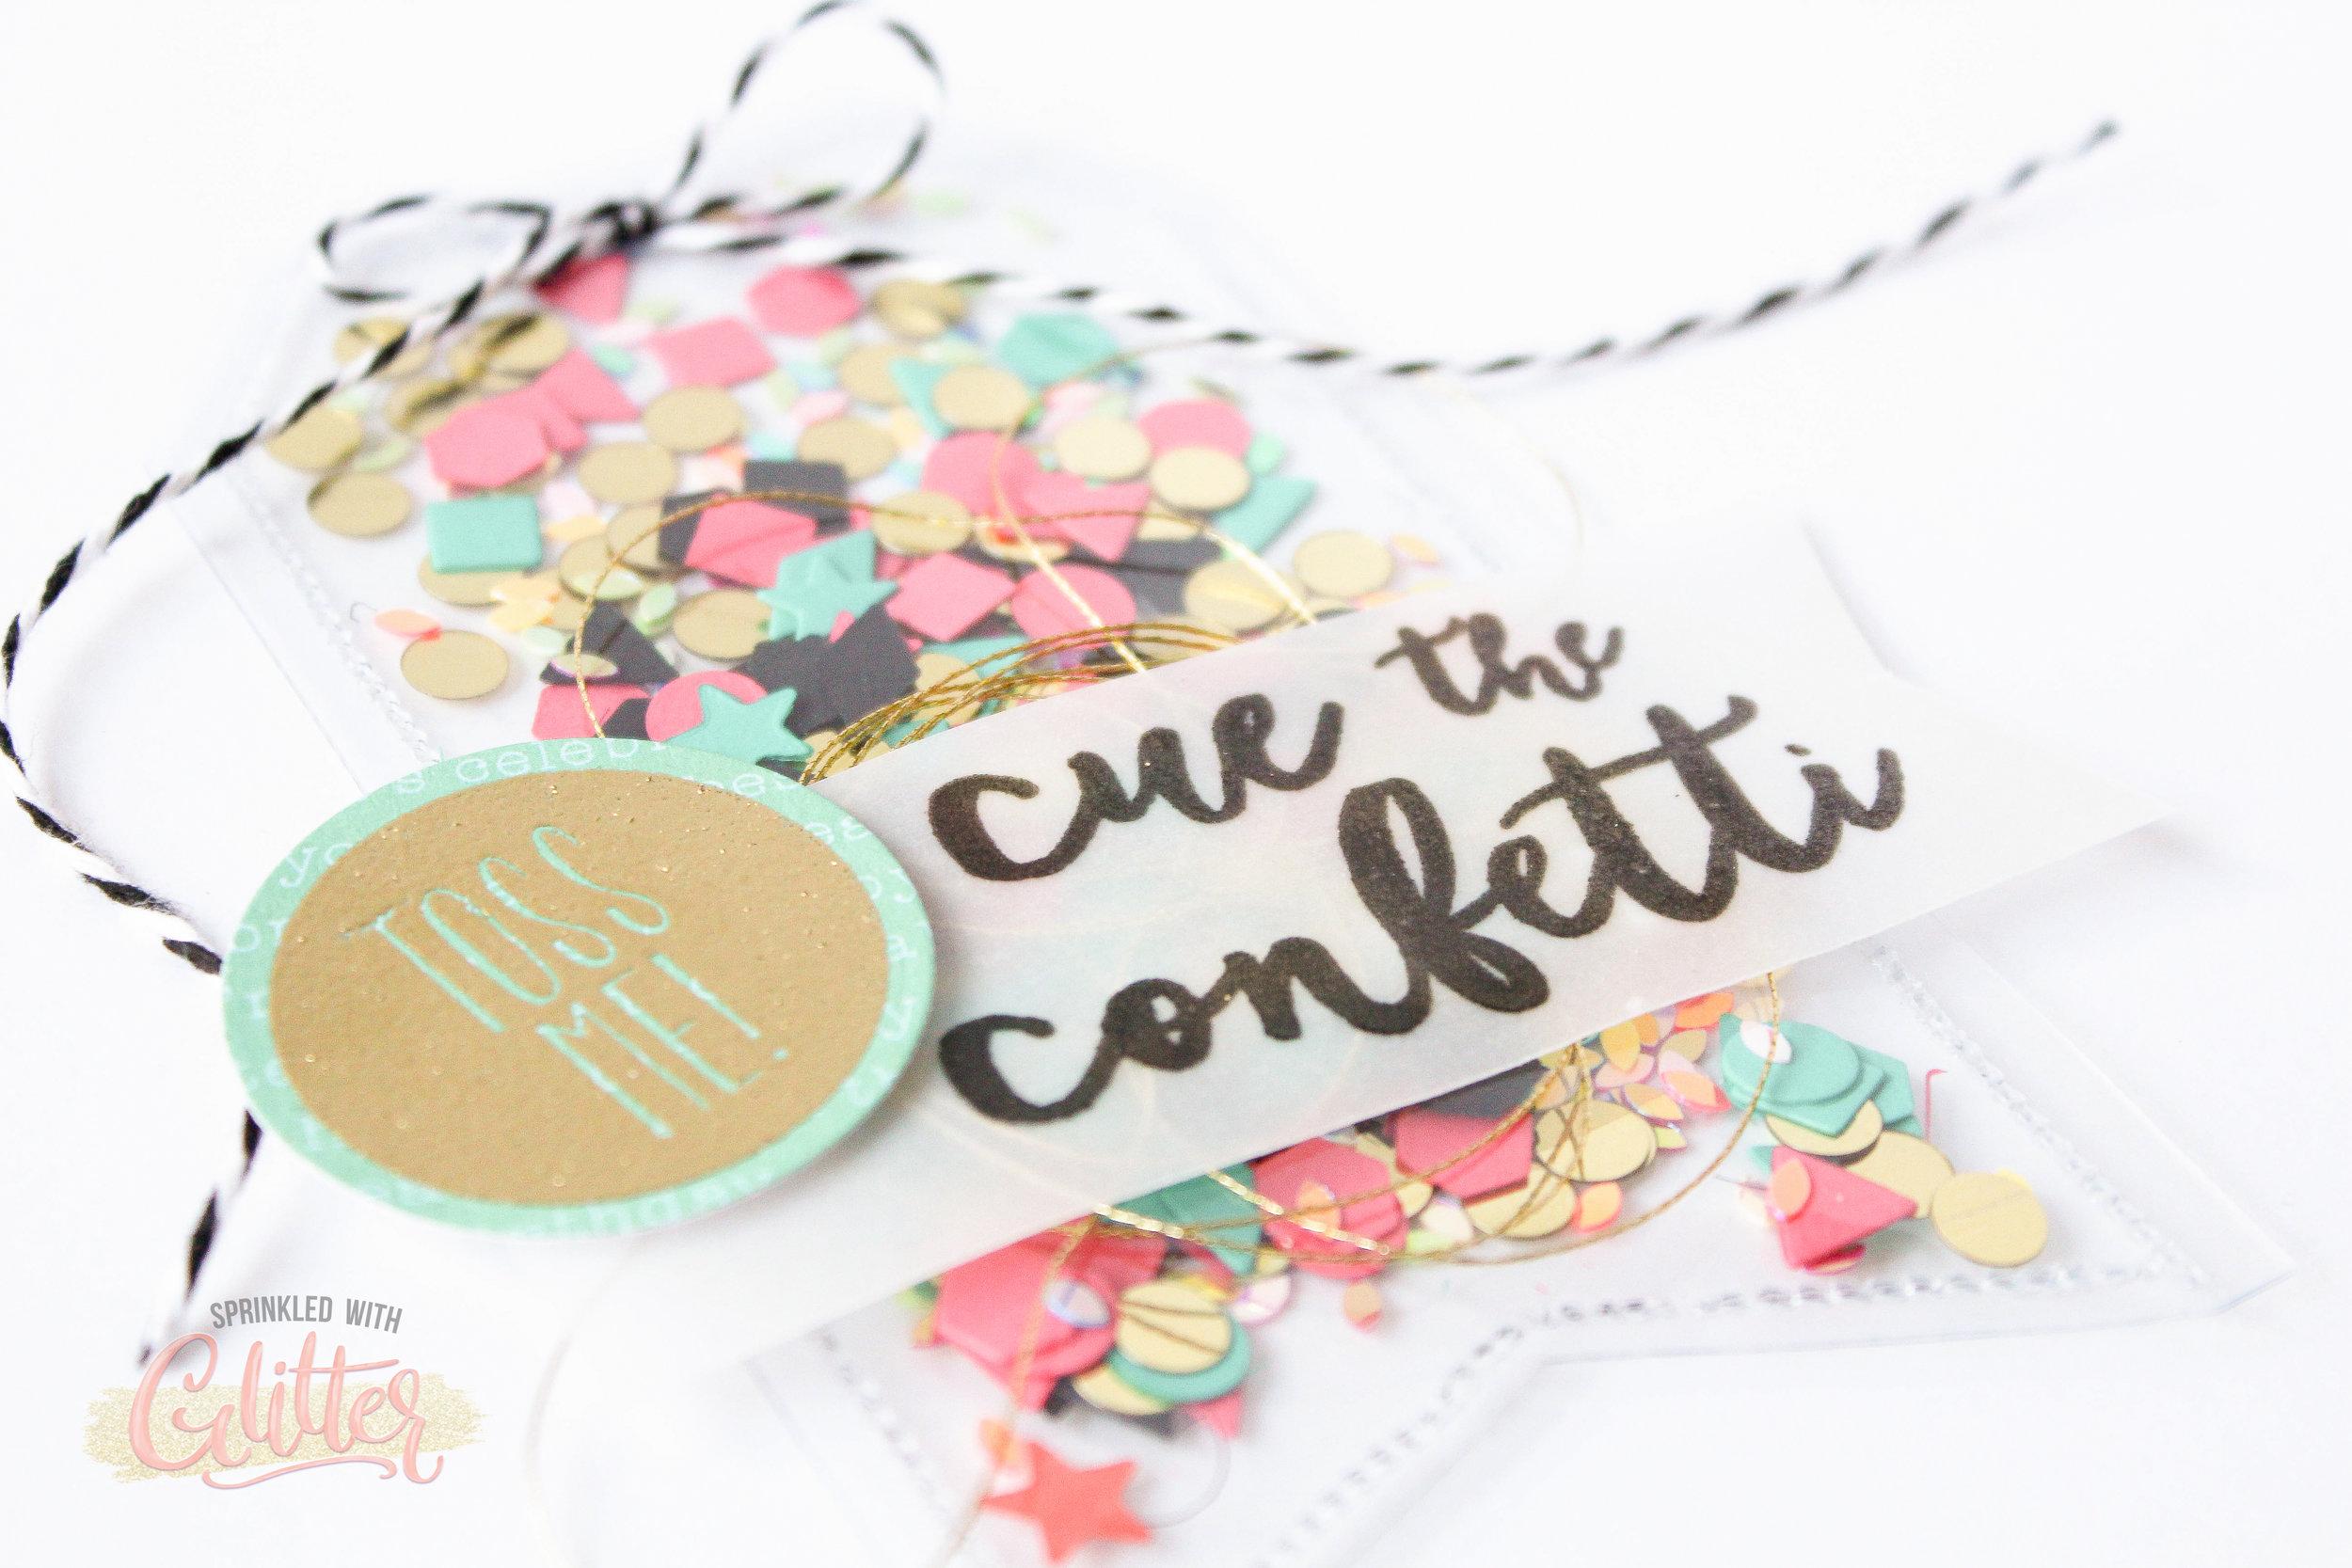 Confetti shaker tags watermark-13.jpg